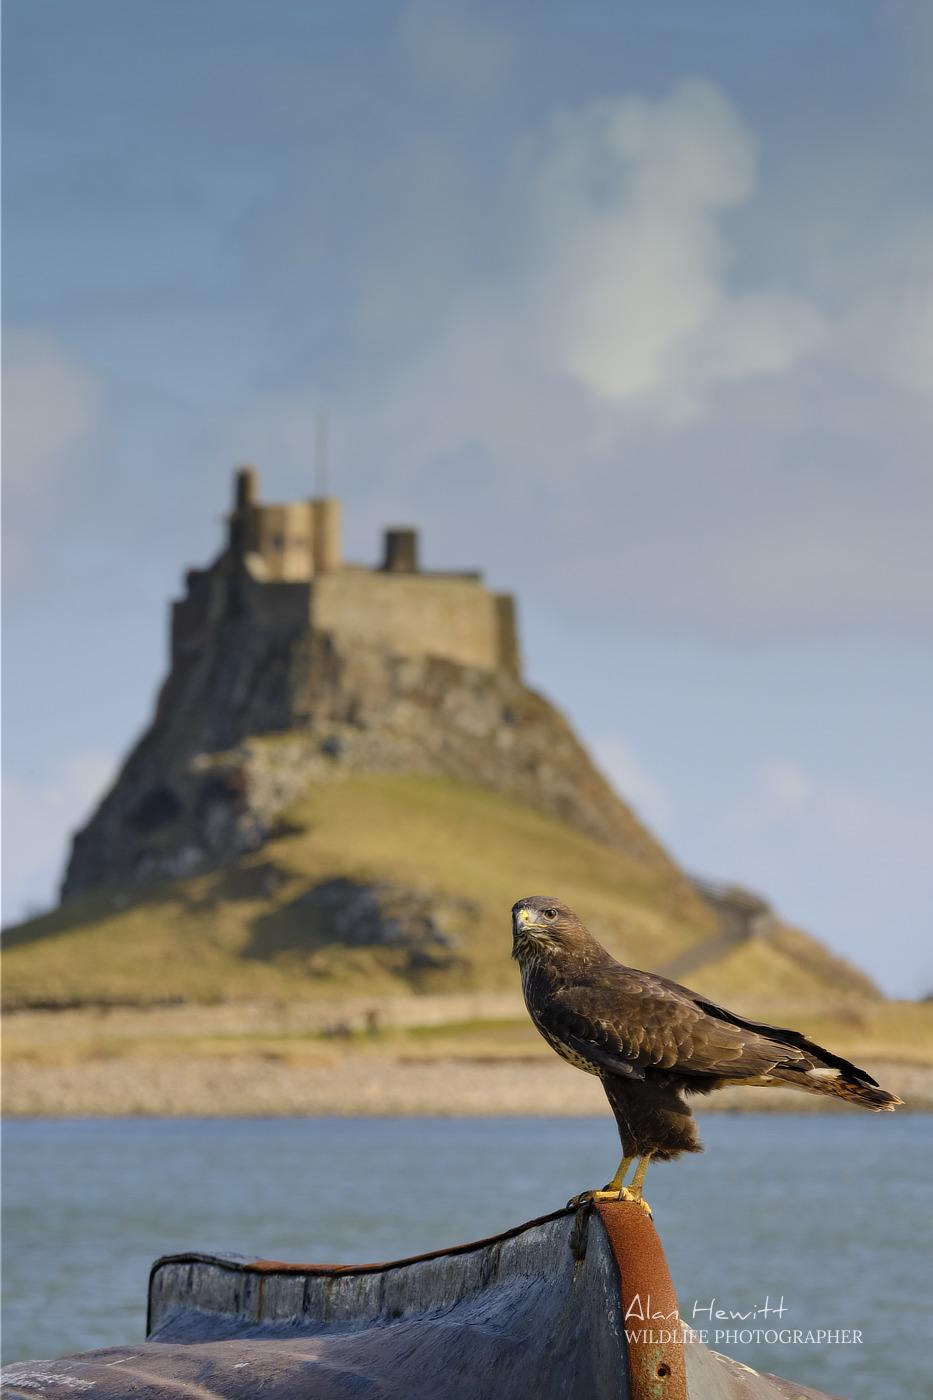 Common Buzzard Holy Island Northumberland Birds of Prey Photography Workshop Alan Hewitt